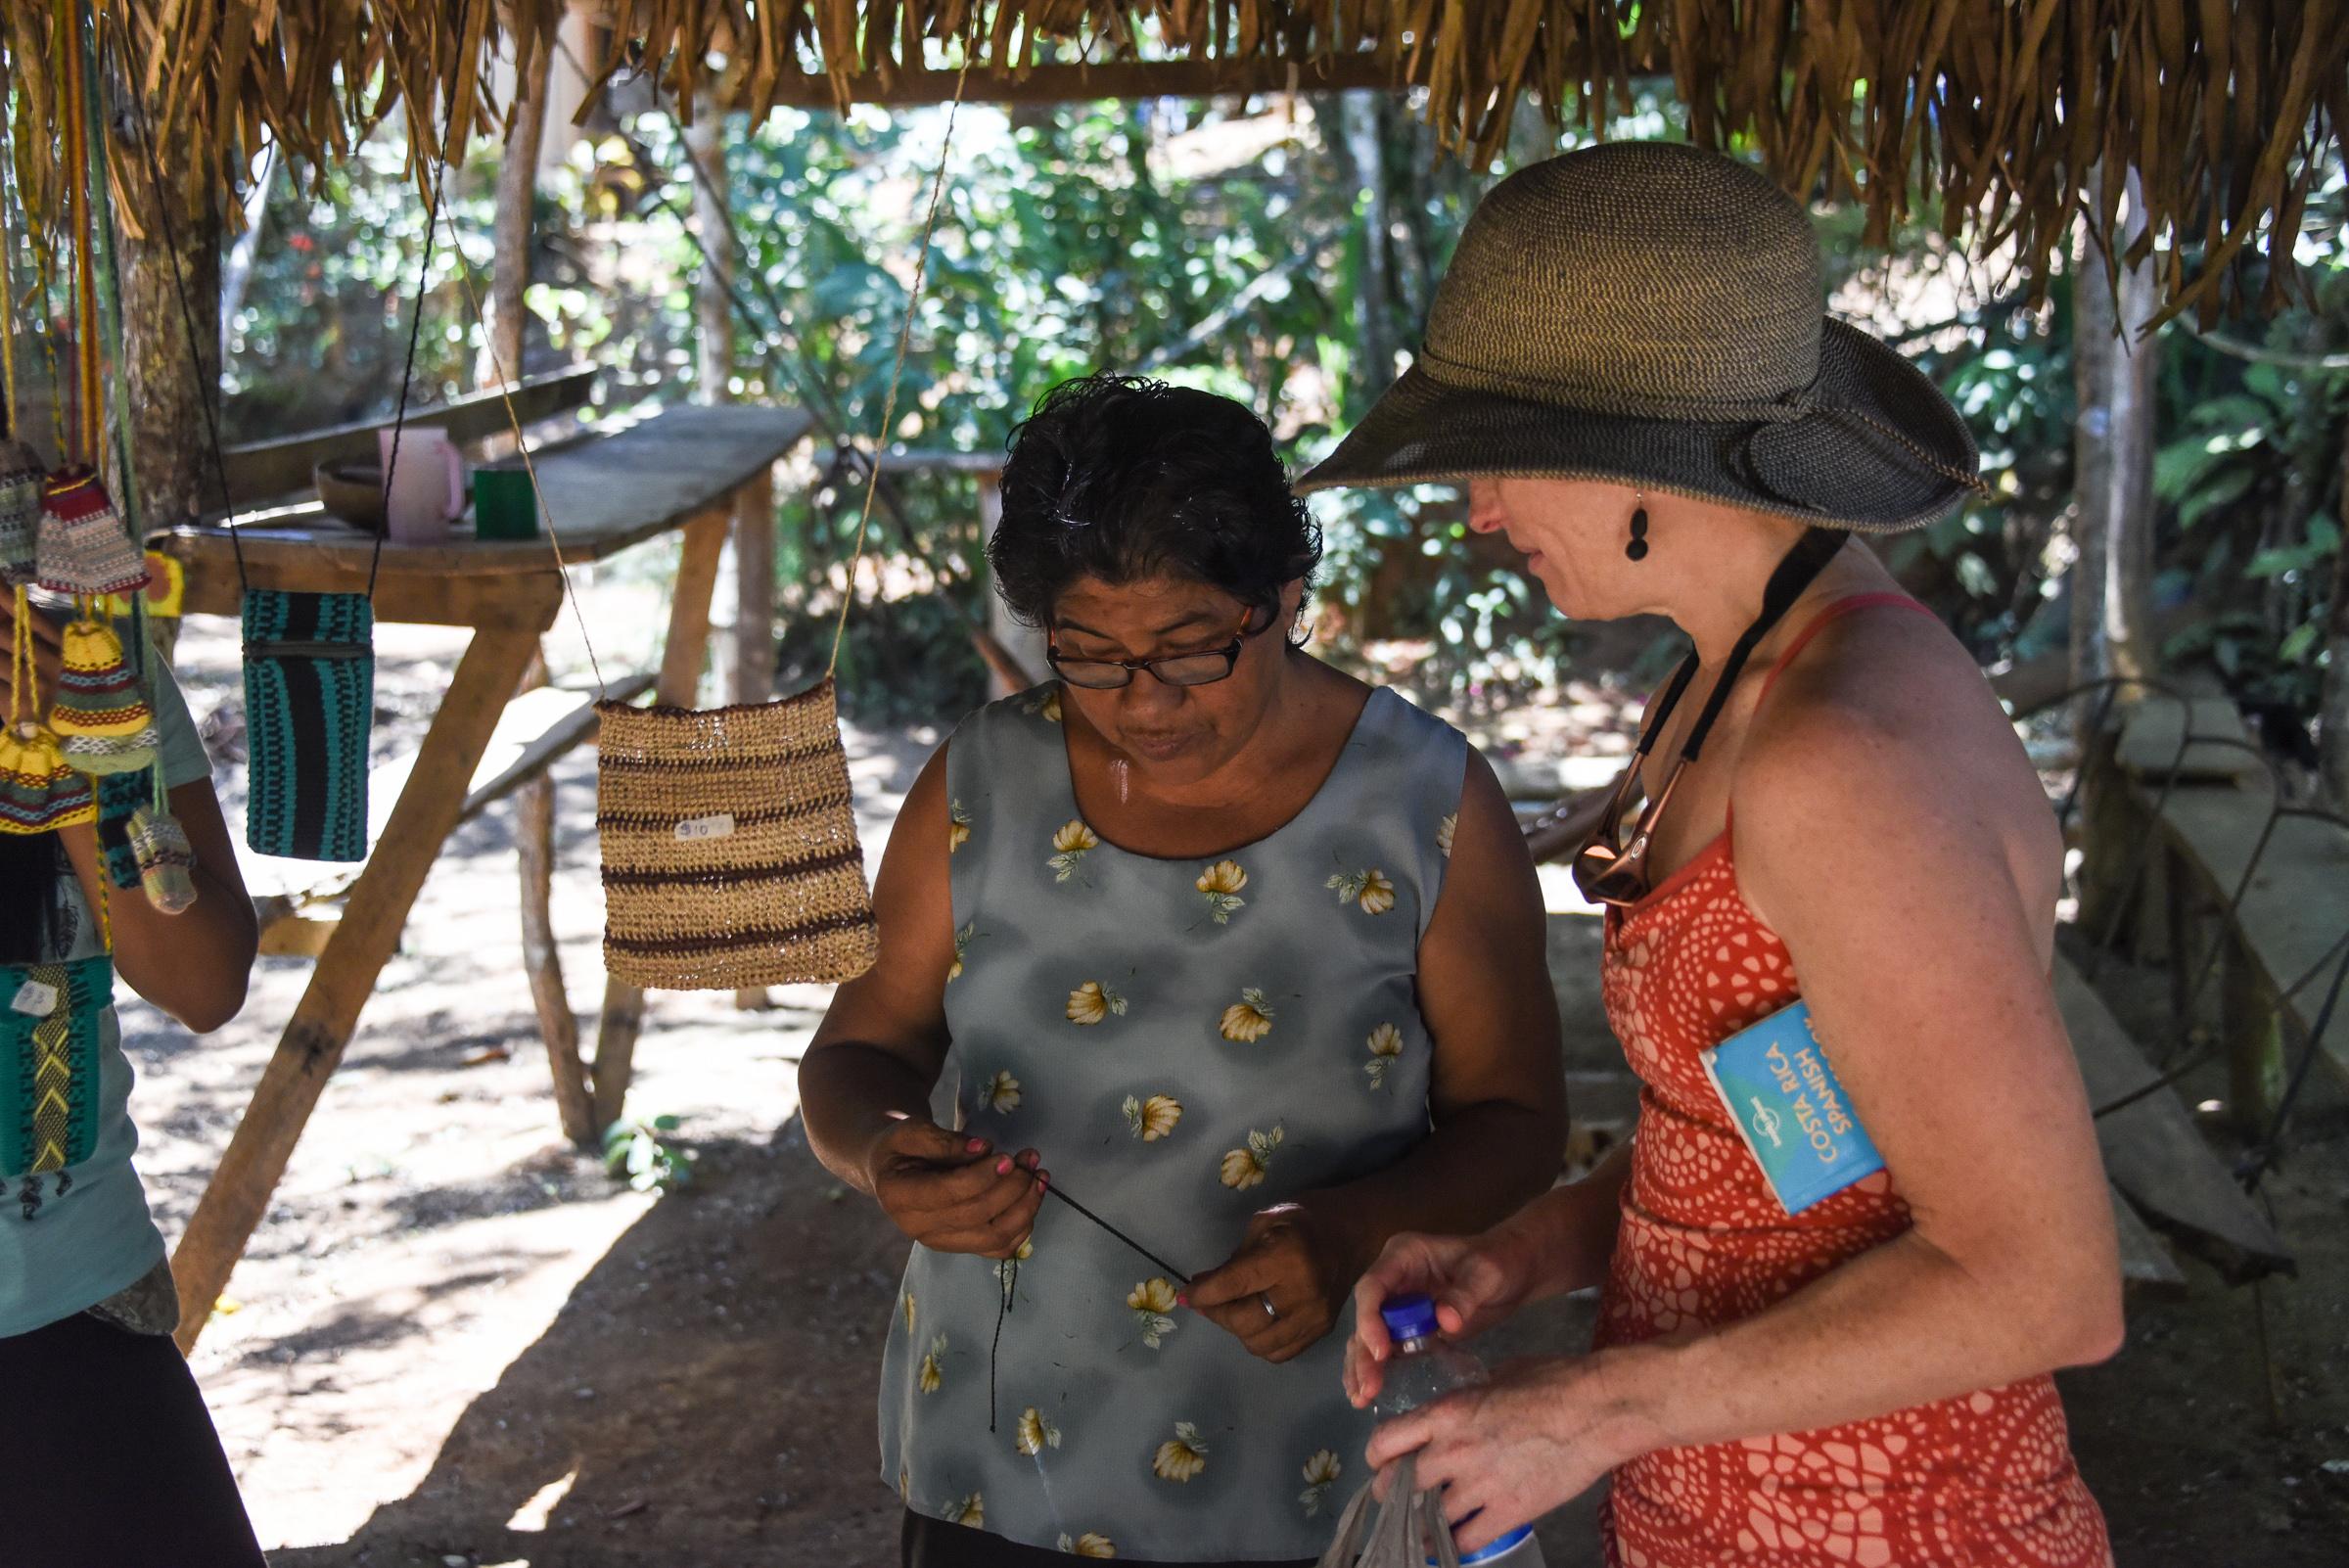 Melissa with an artisan in the Boruca village, Costa Rica